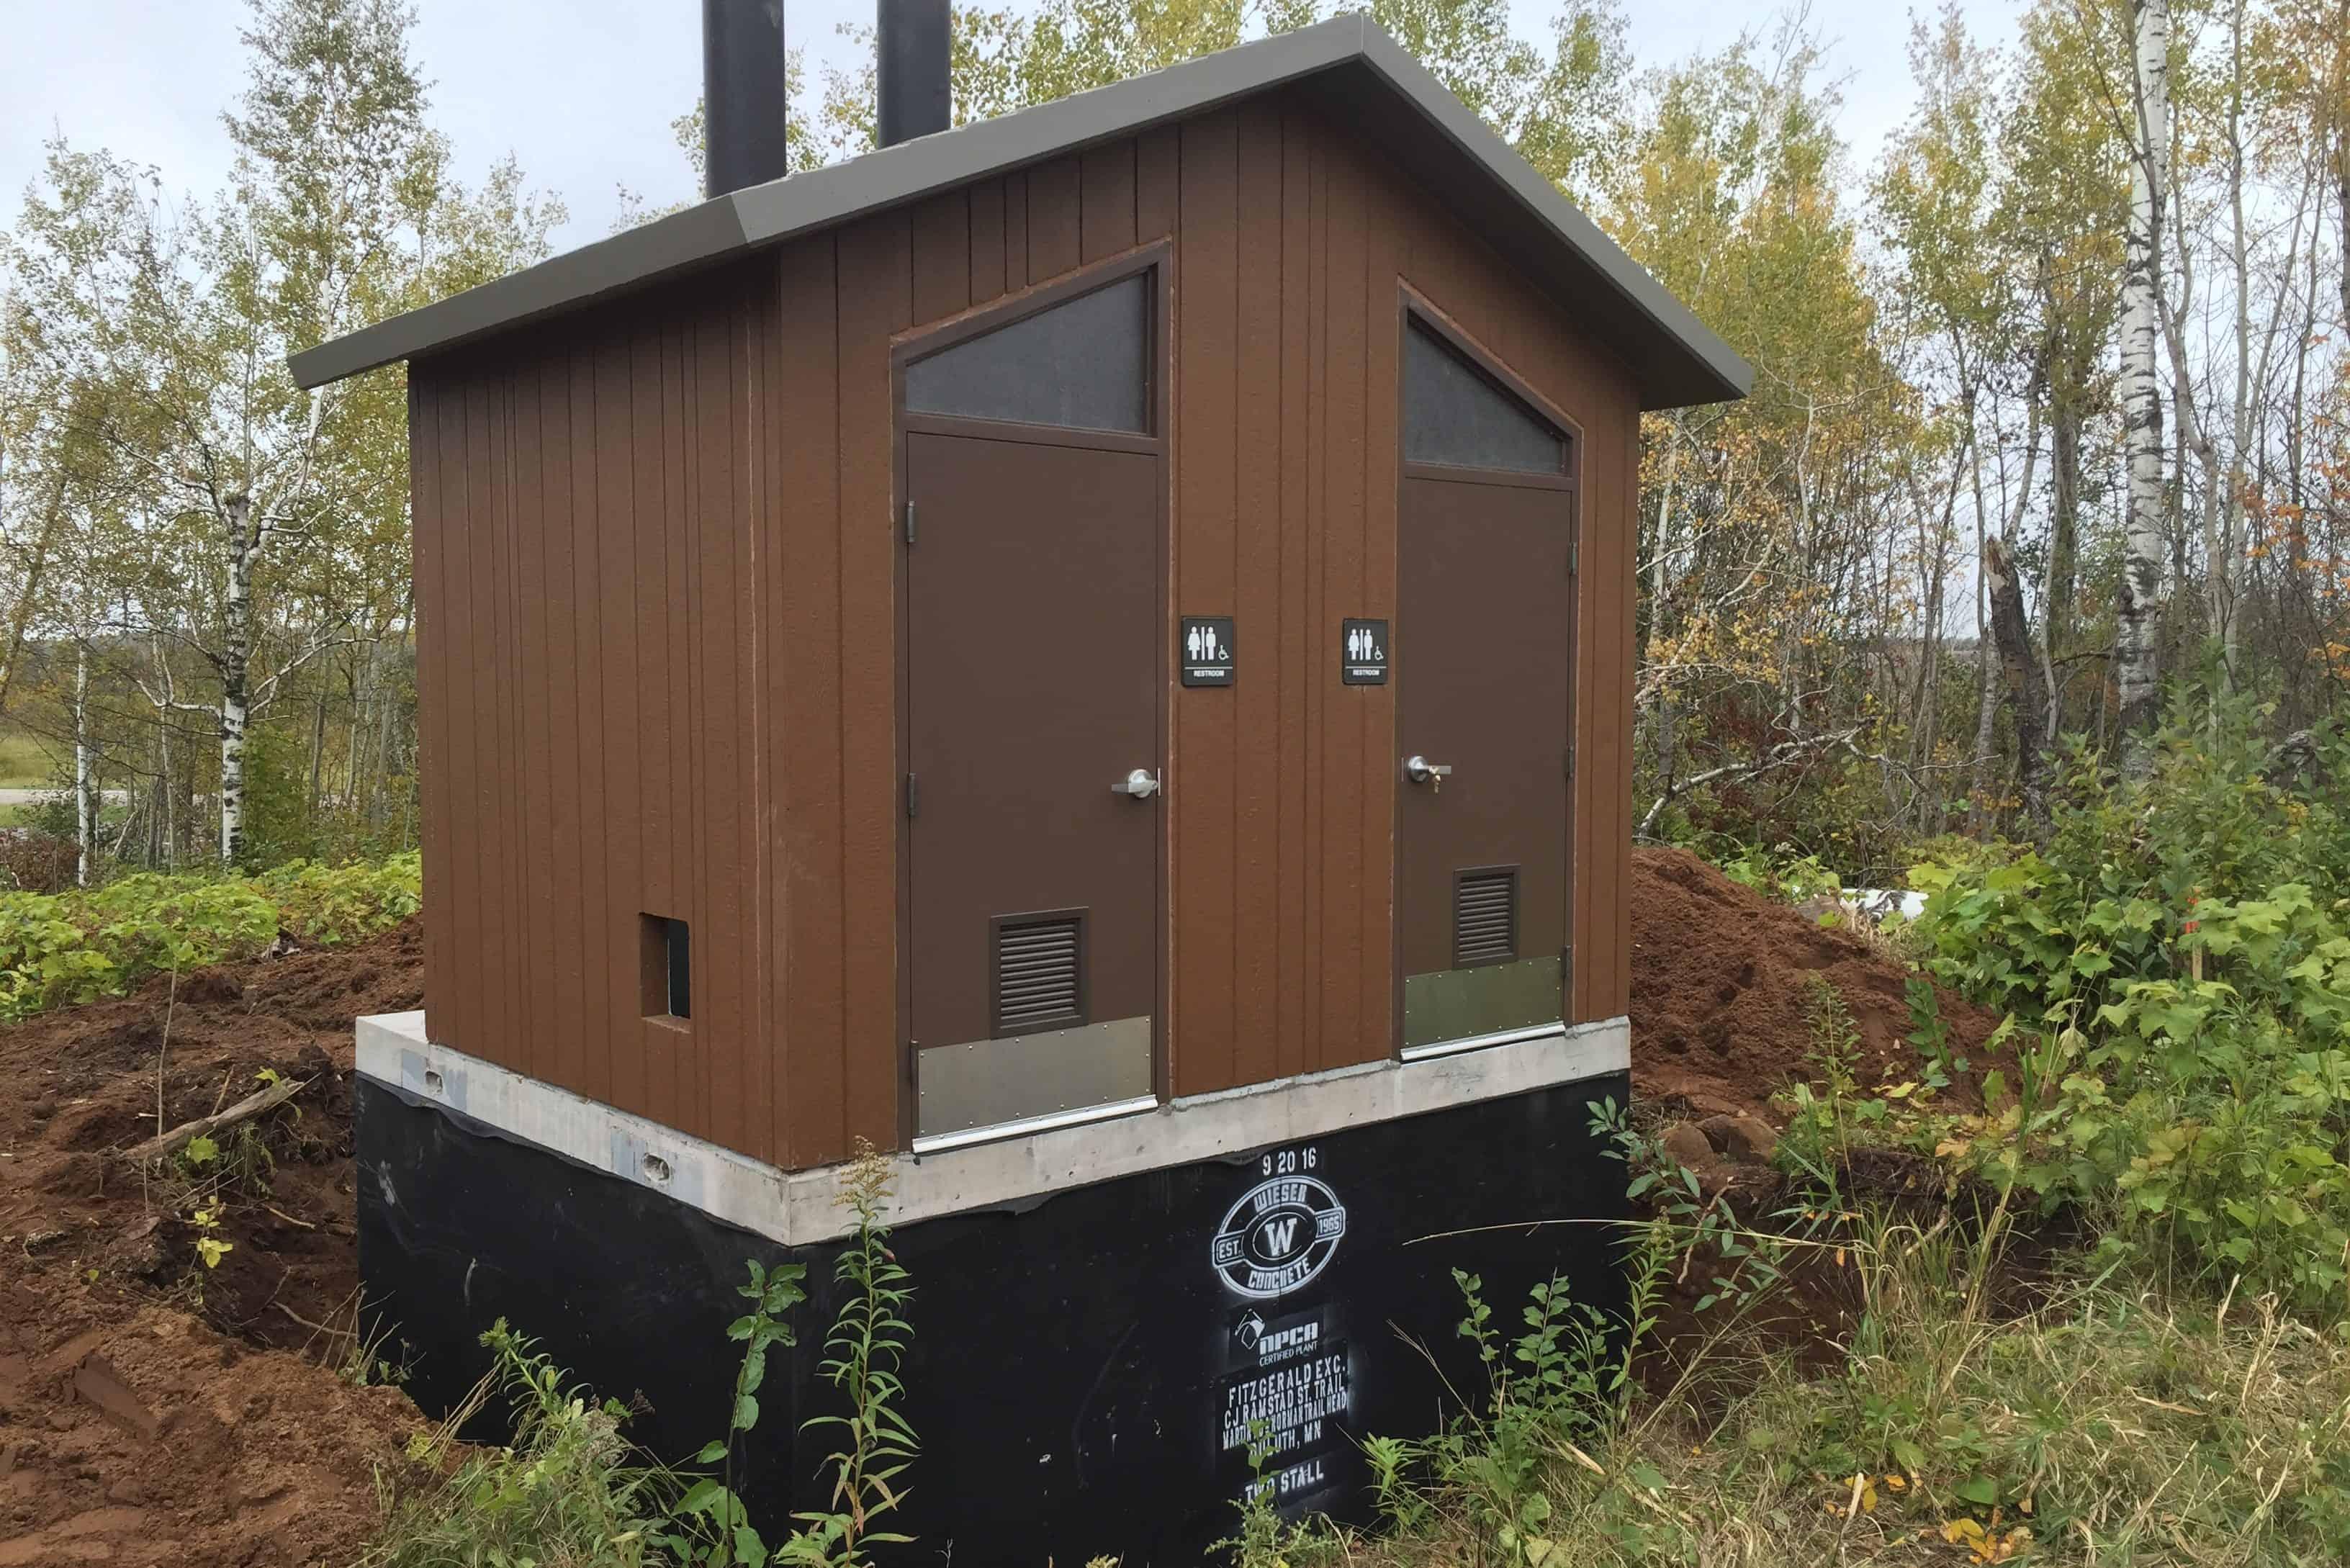 CJ Ramstad State Trail Bathrooms Precast Concrete Building